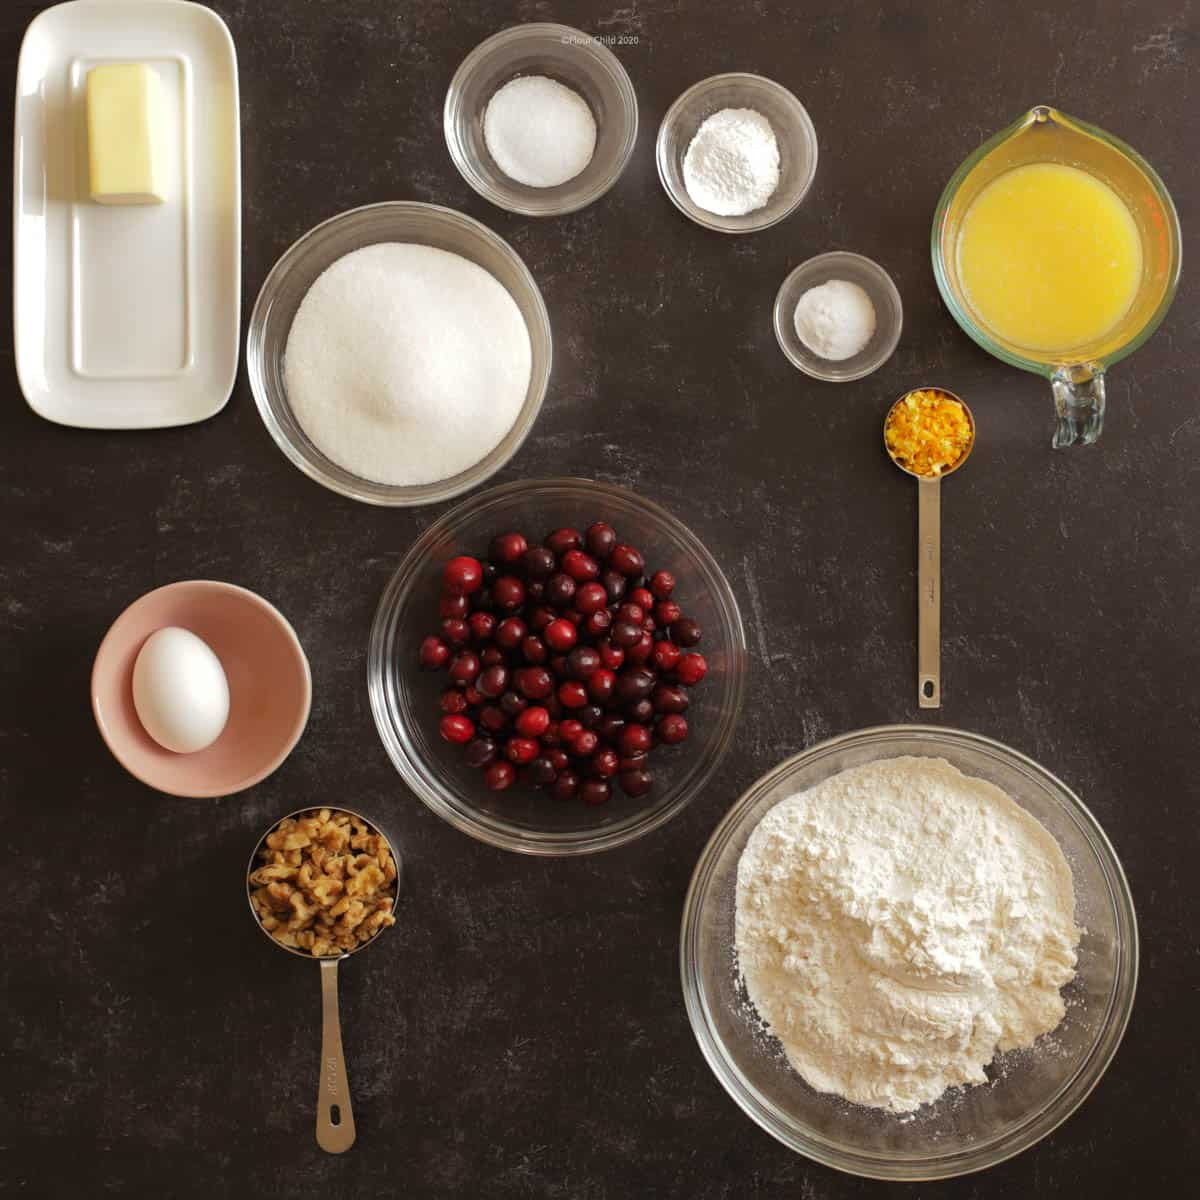 Cranberry Orange Bread ingredients in prep bowls